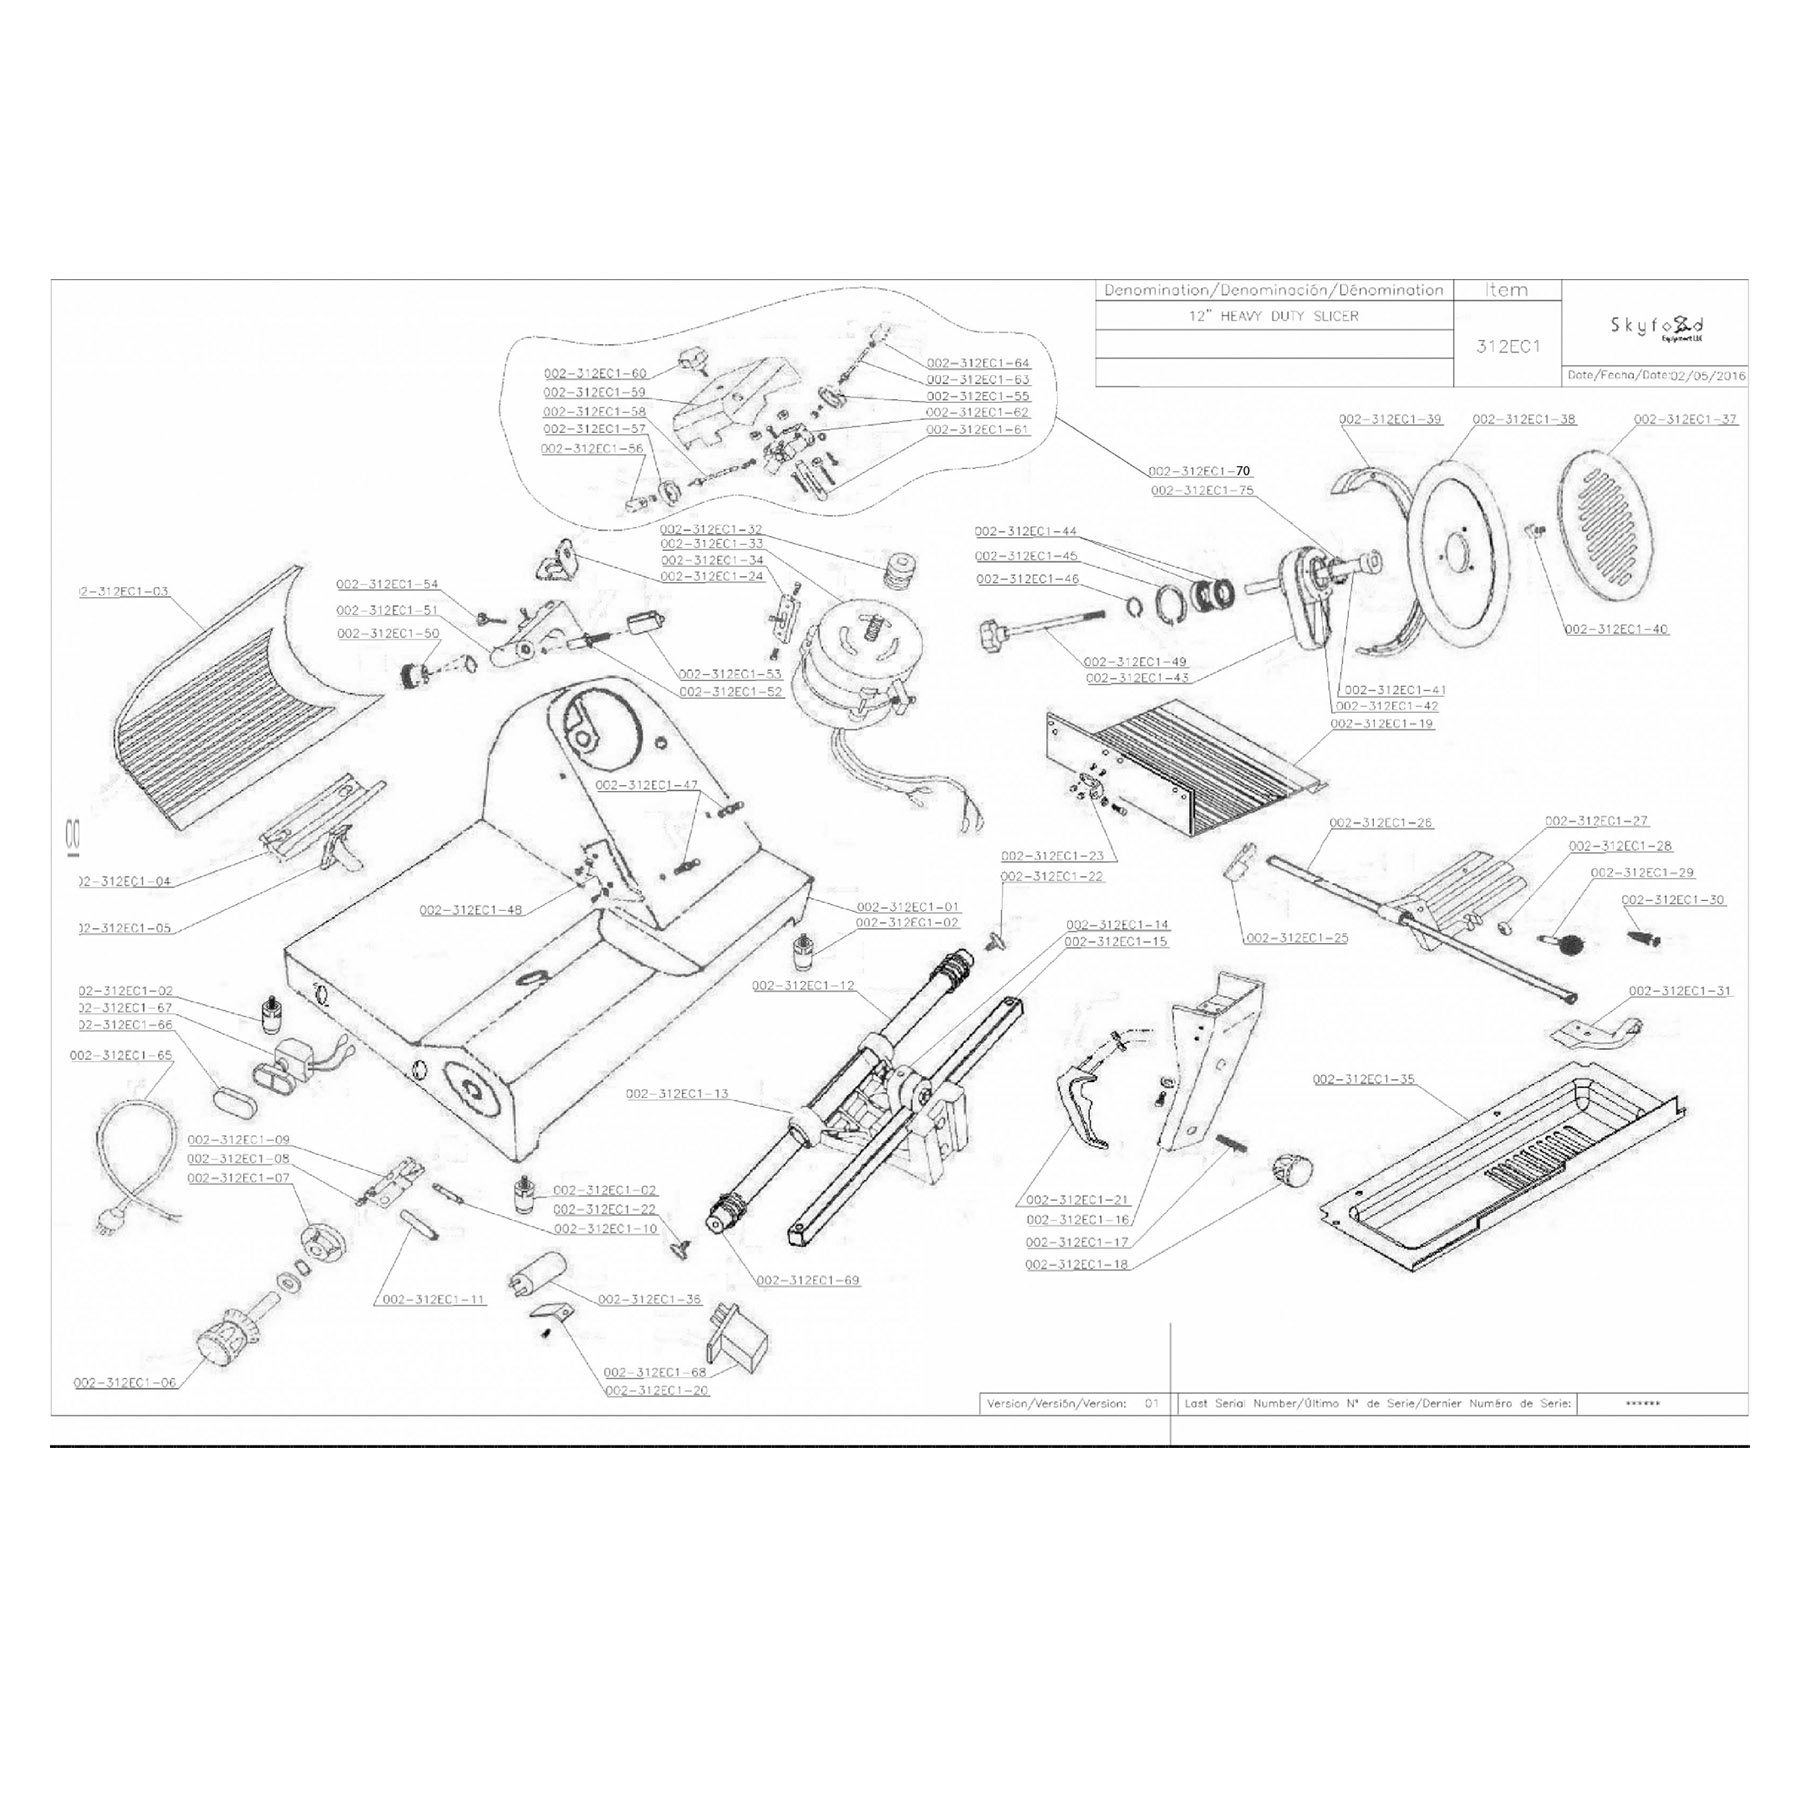 Skyfood 312ec1 12 Heavy Duty Deli Slicer 1 2 Hp